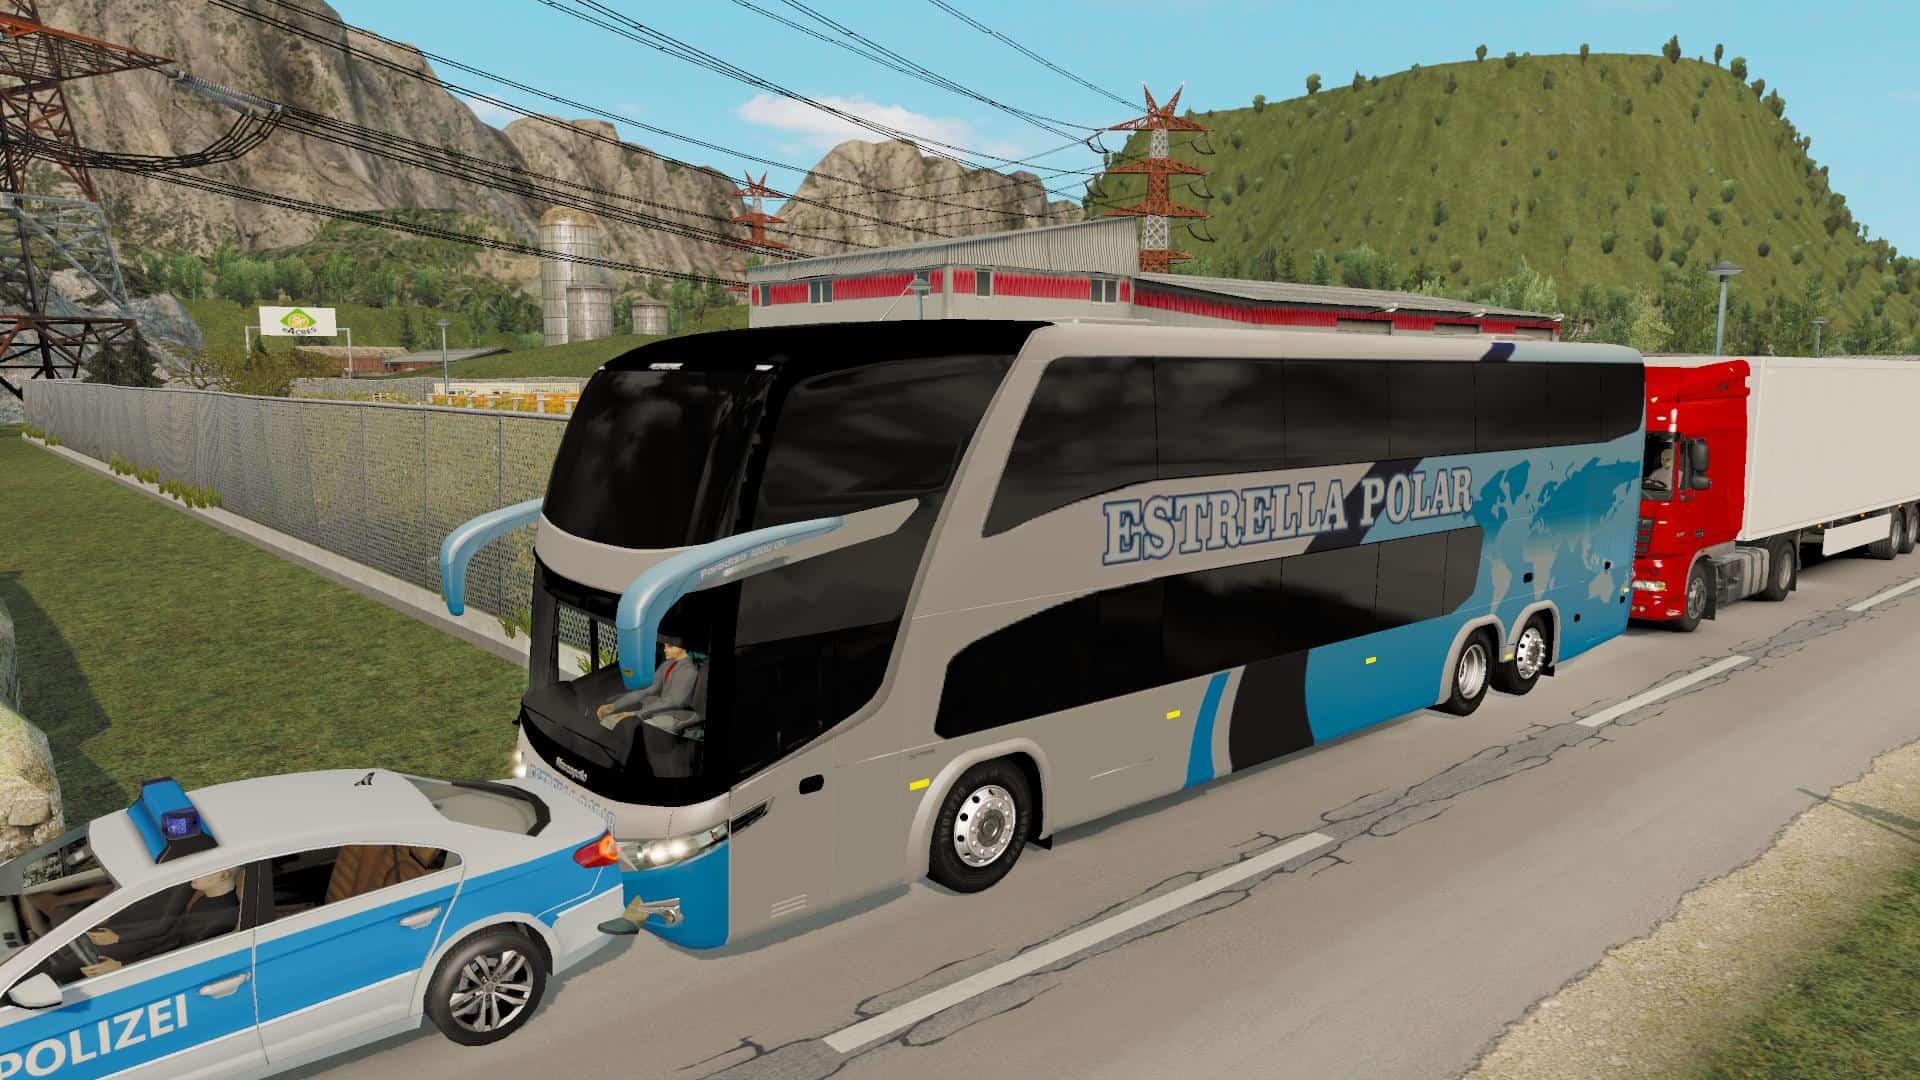 BUS TRAFFIC PACK G7 1 35 ETS2 - American Truck Simulator mod